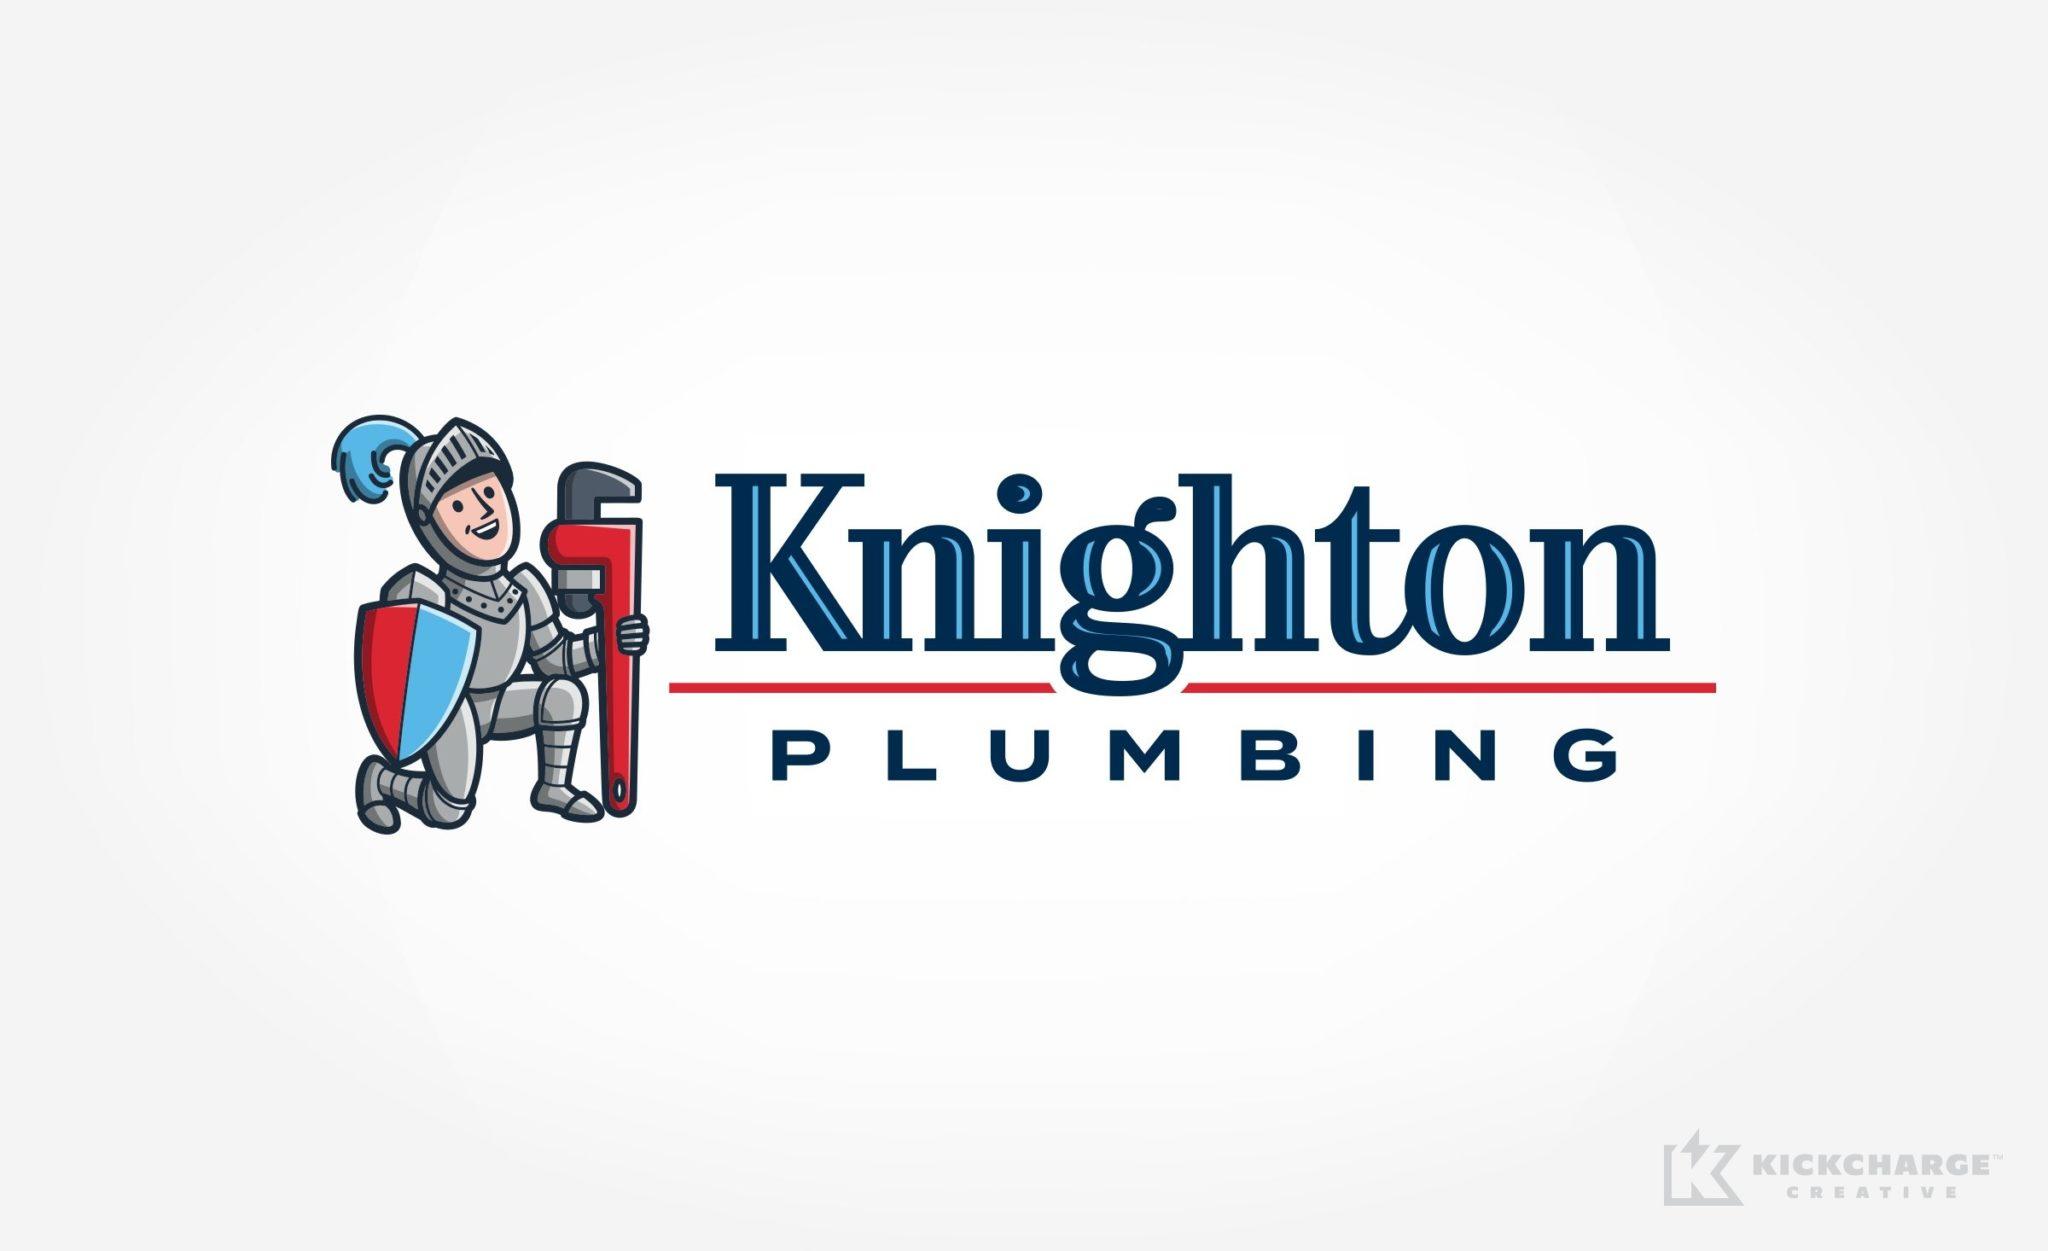 Knighton Plumbing